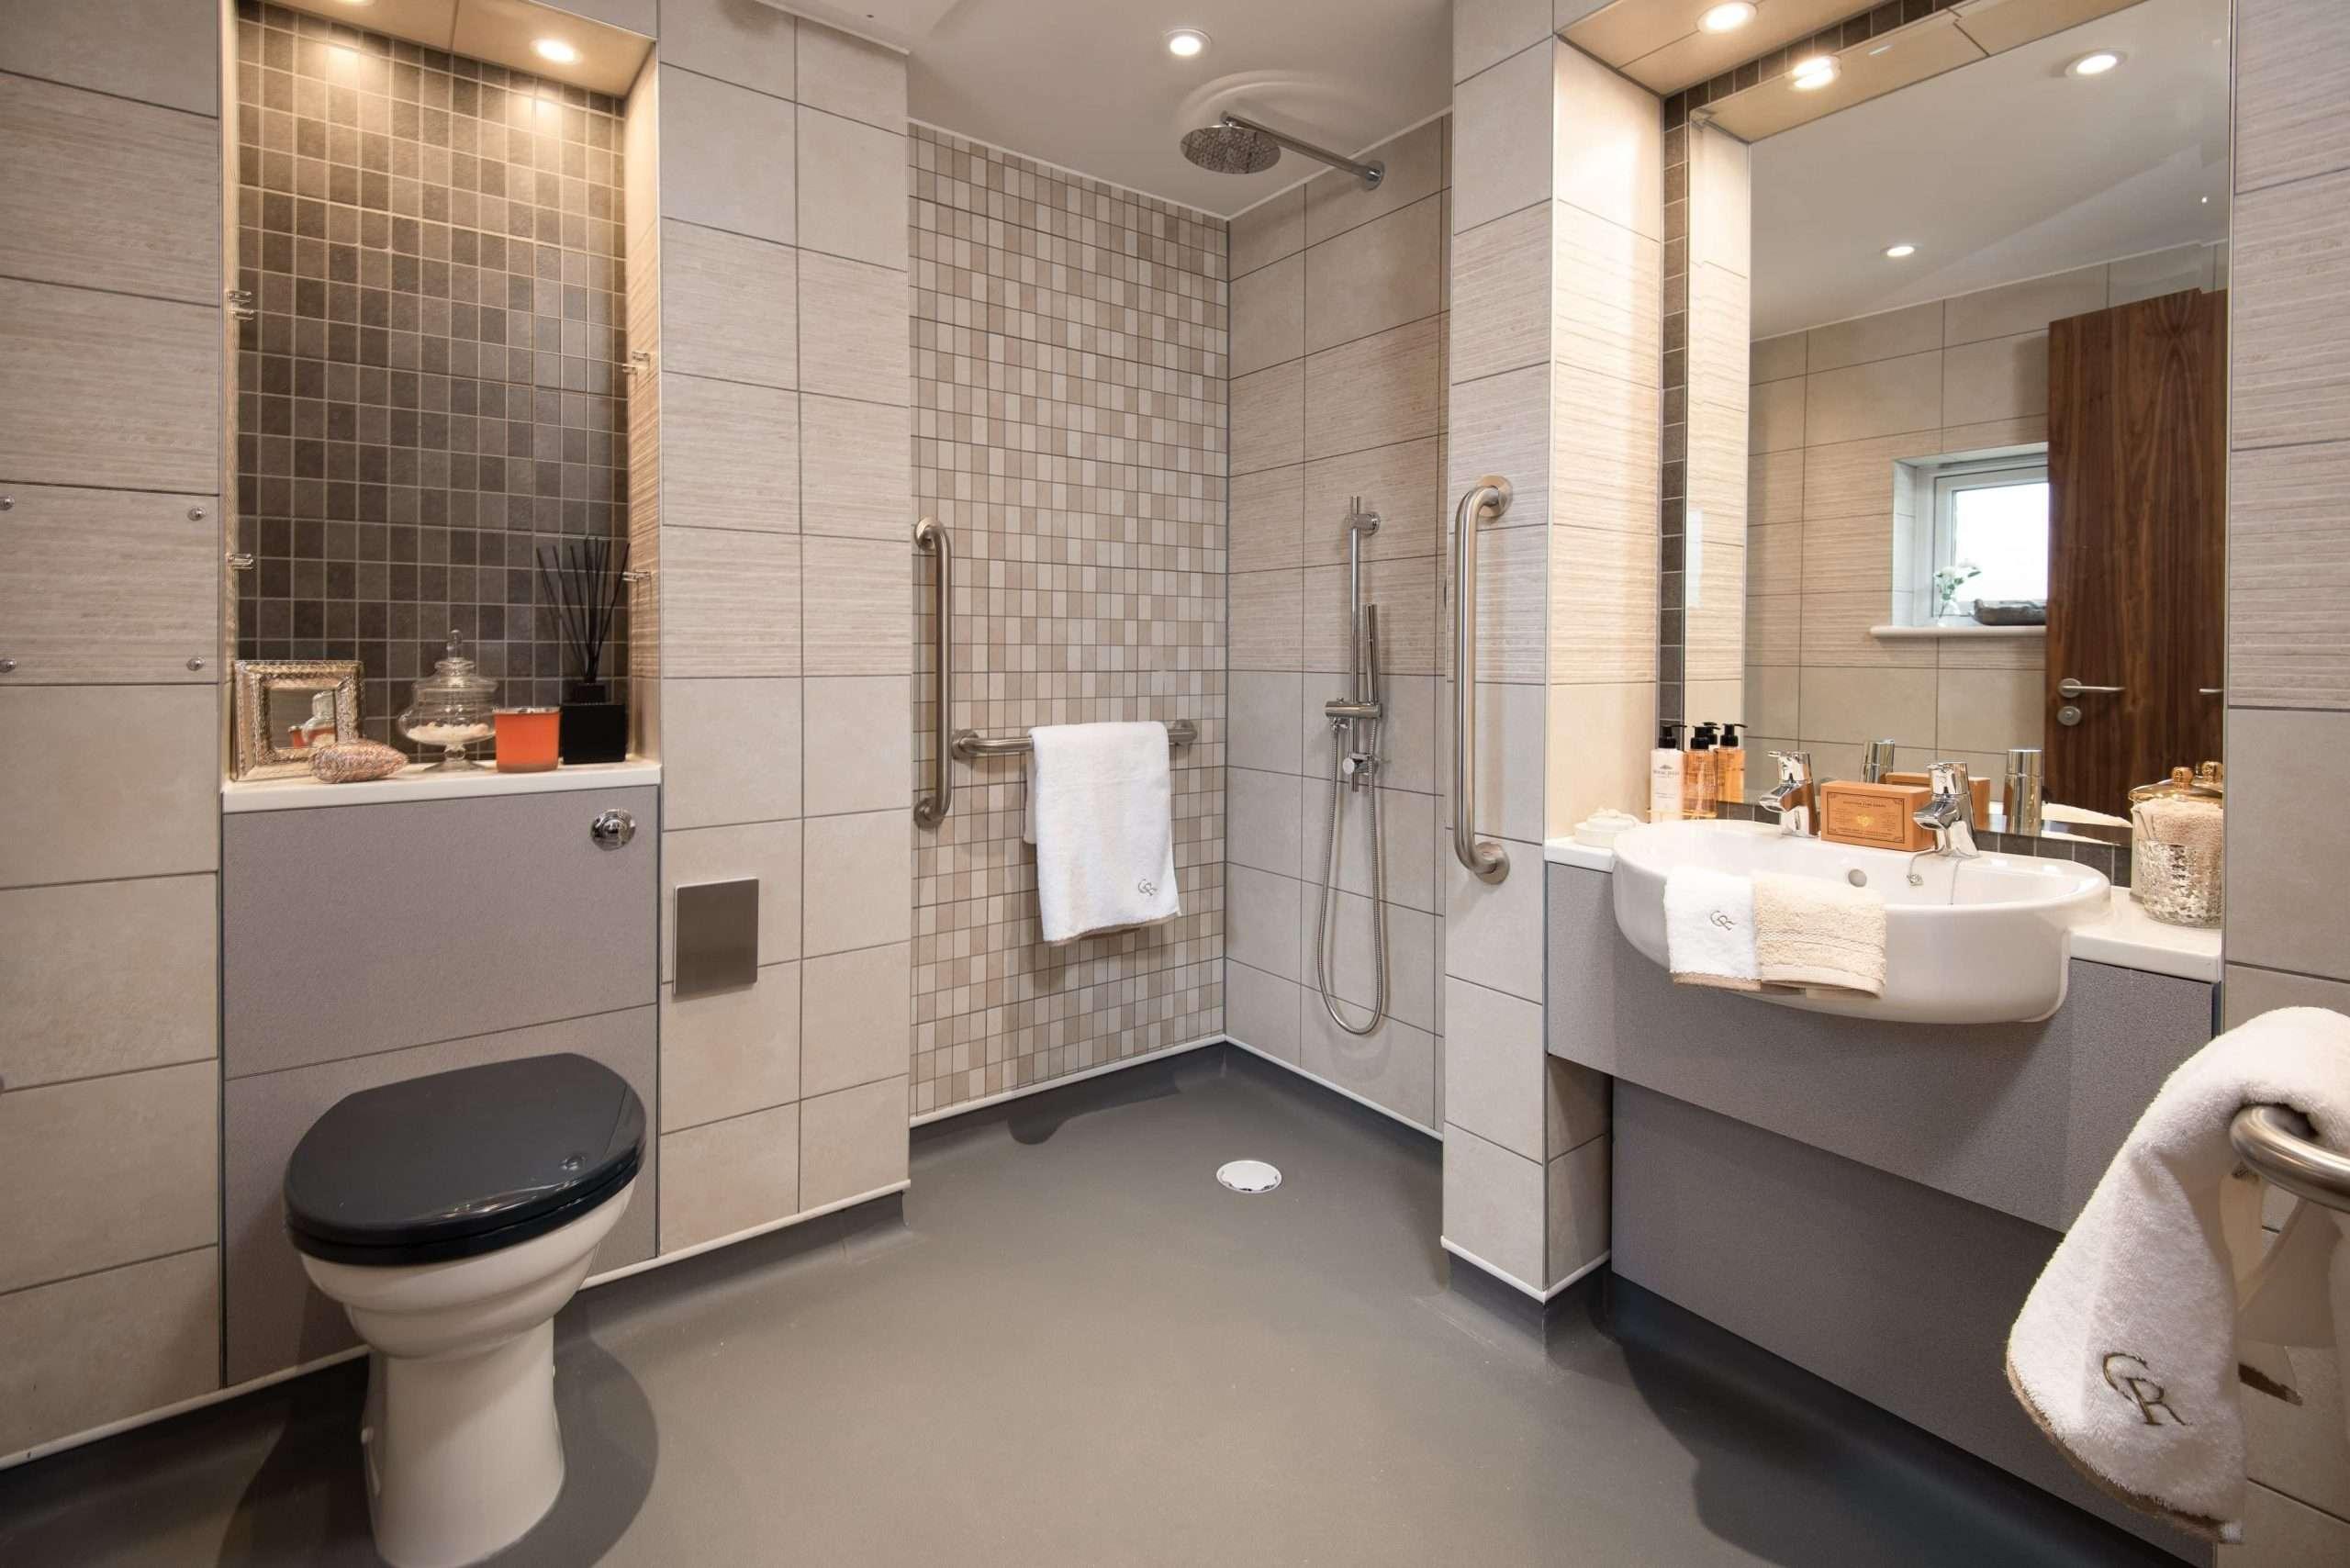 Ensuite bathroom with wet room